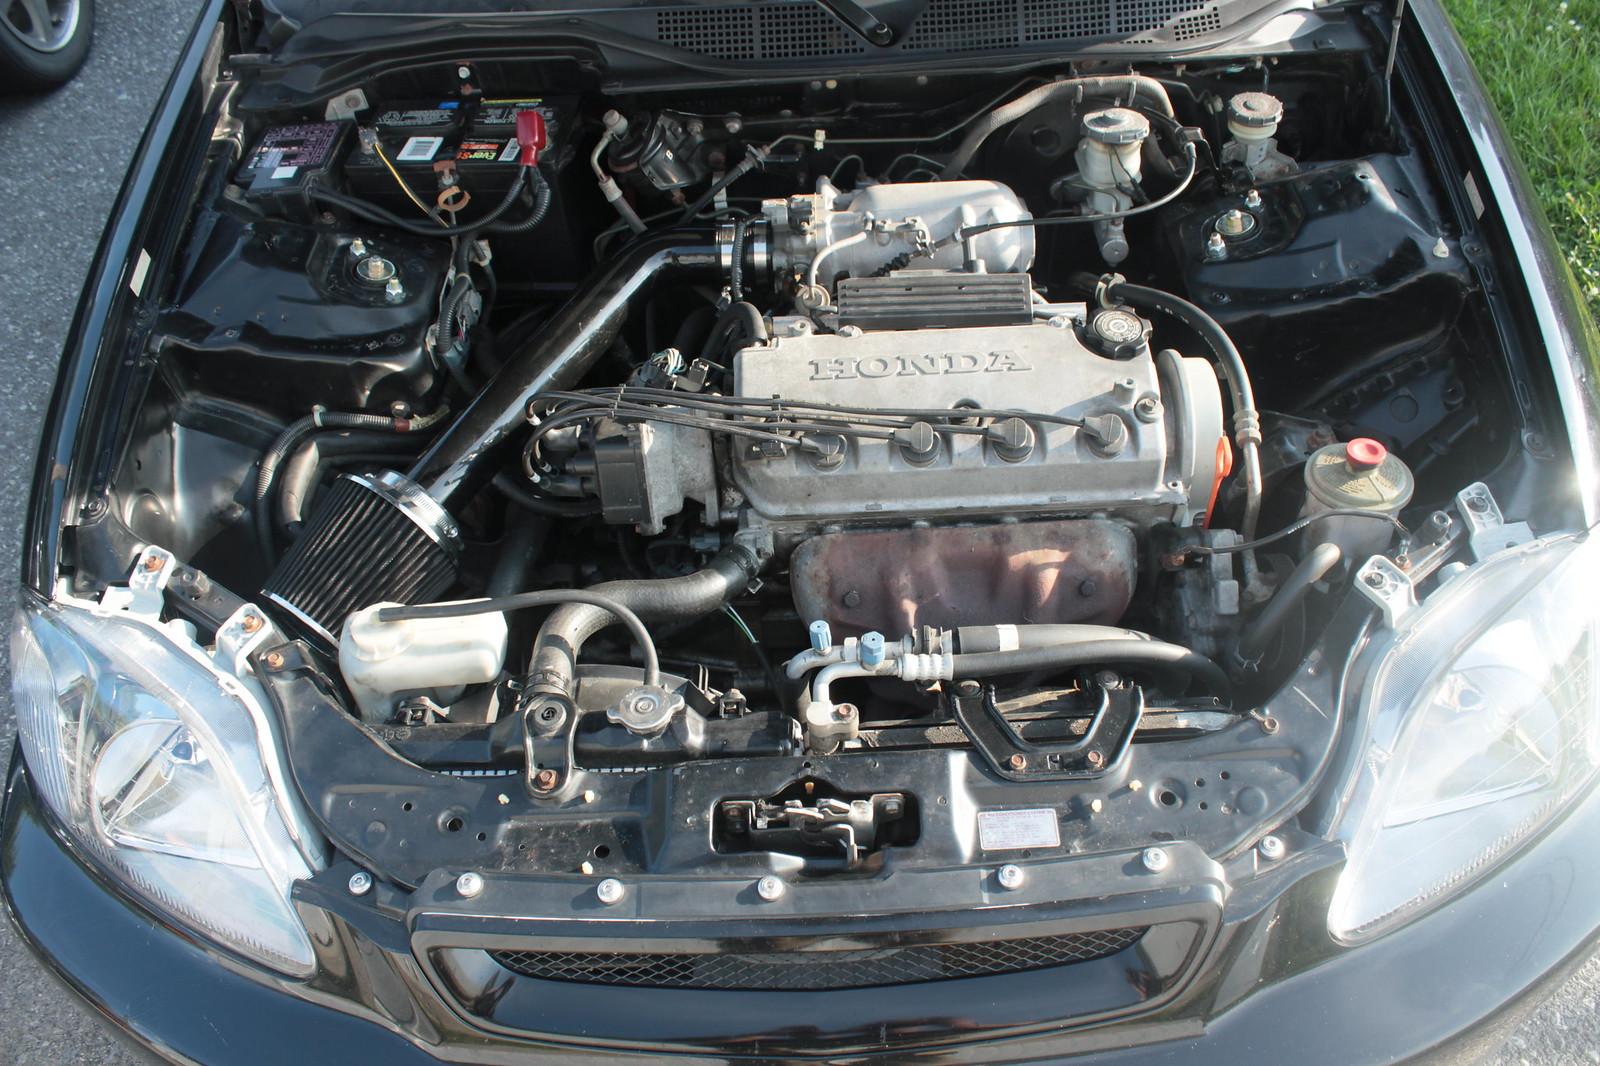 1996 2000 Honda Civic Cruise Control Unit Module Ebay